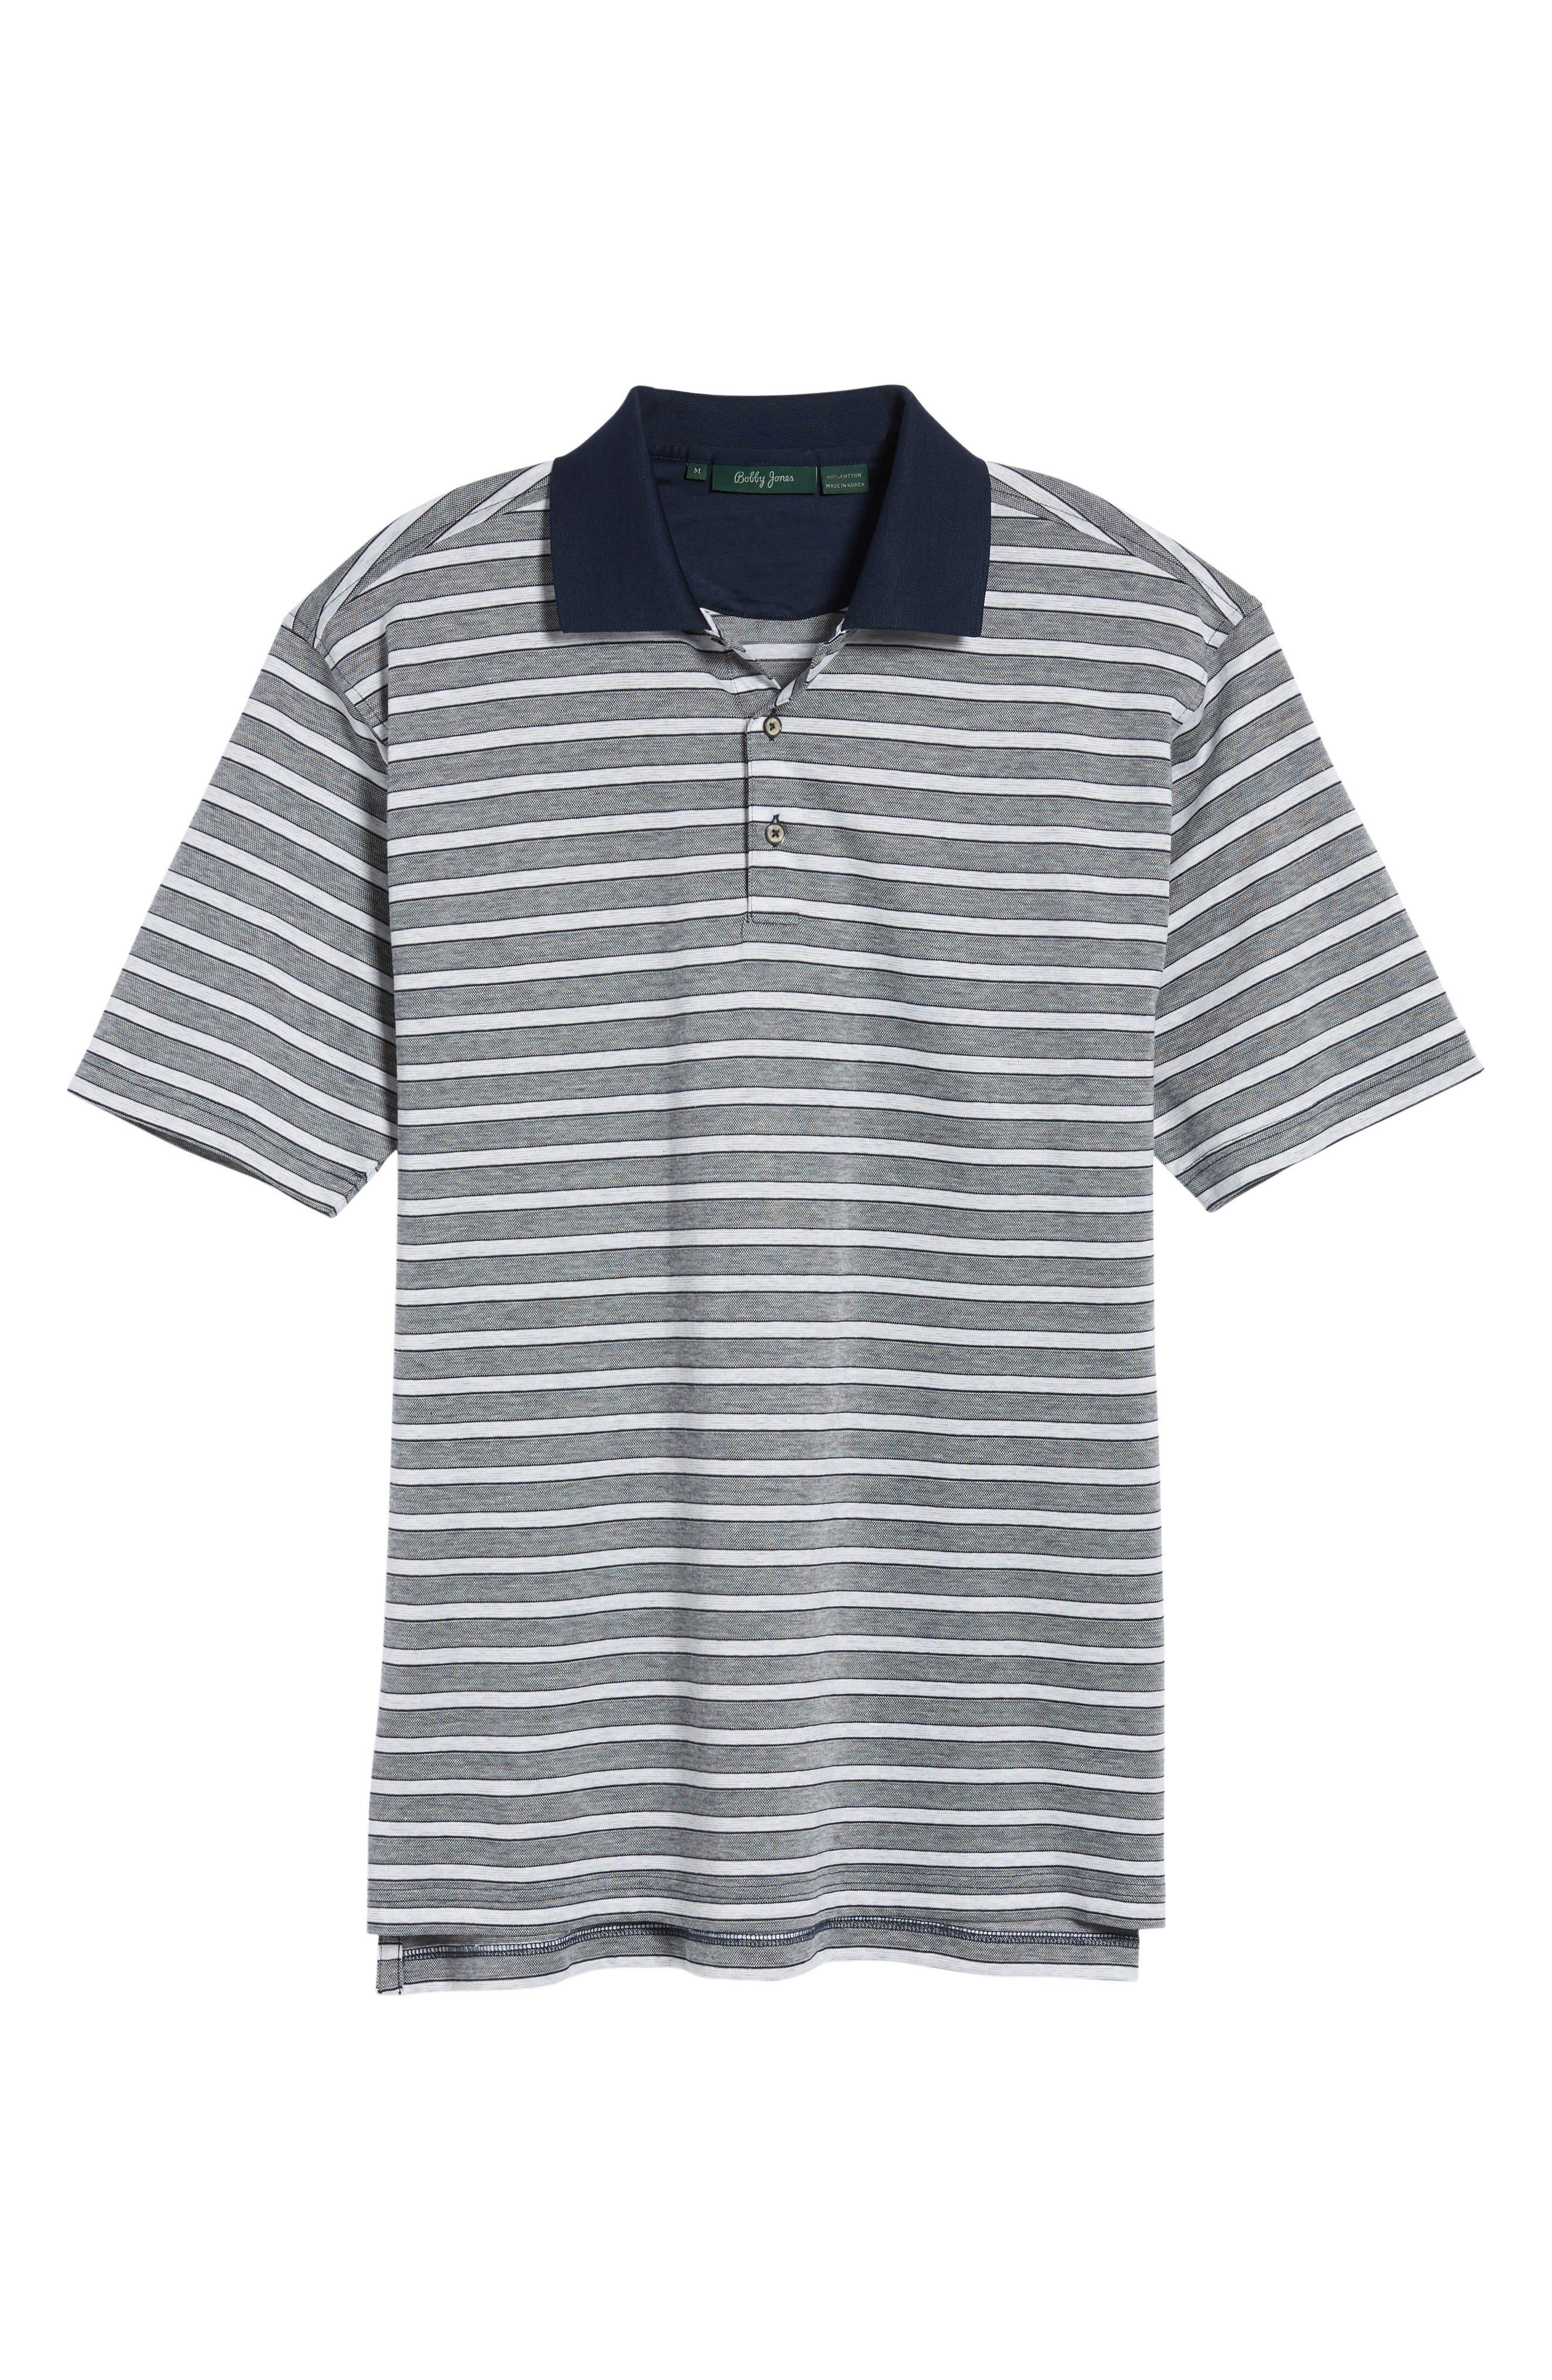 Breene Jacquard Stripe Polo,                             Alternate thumbnail 6, color,                             400